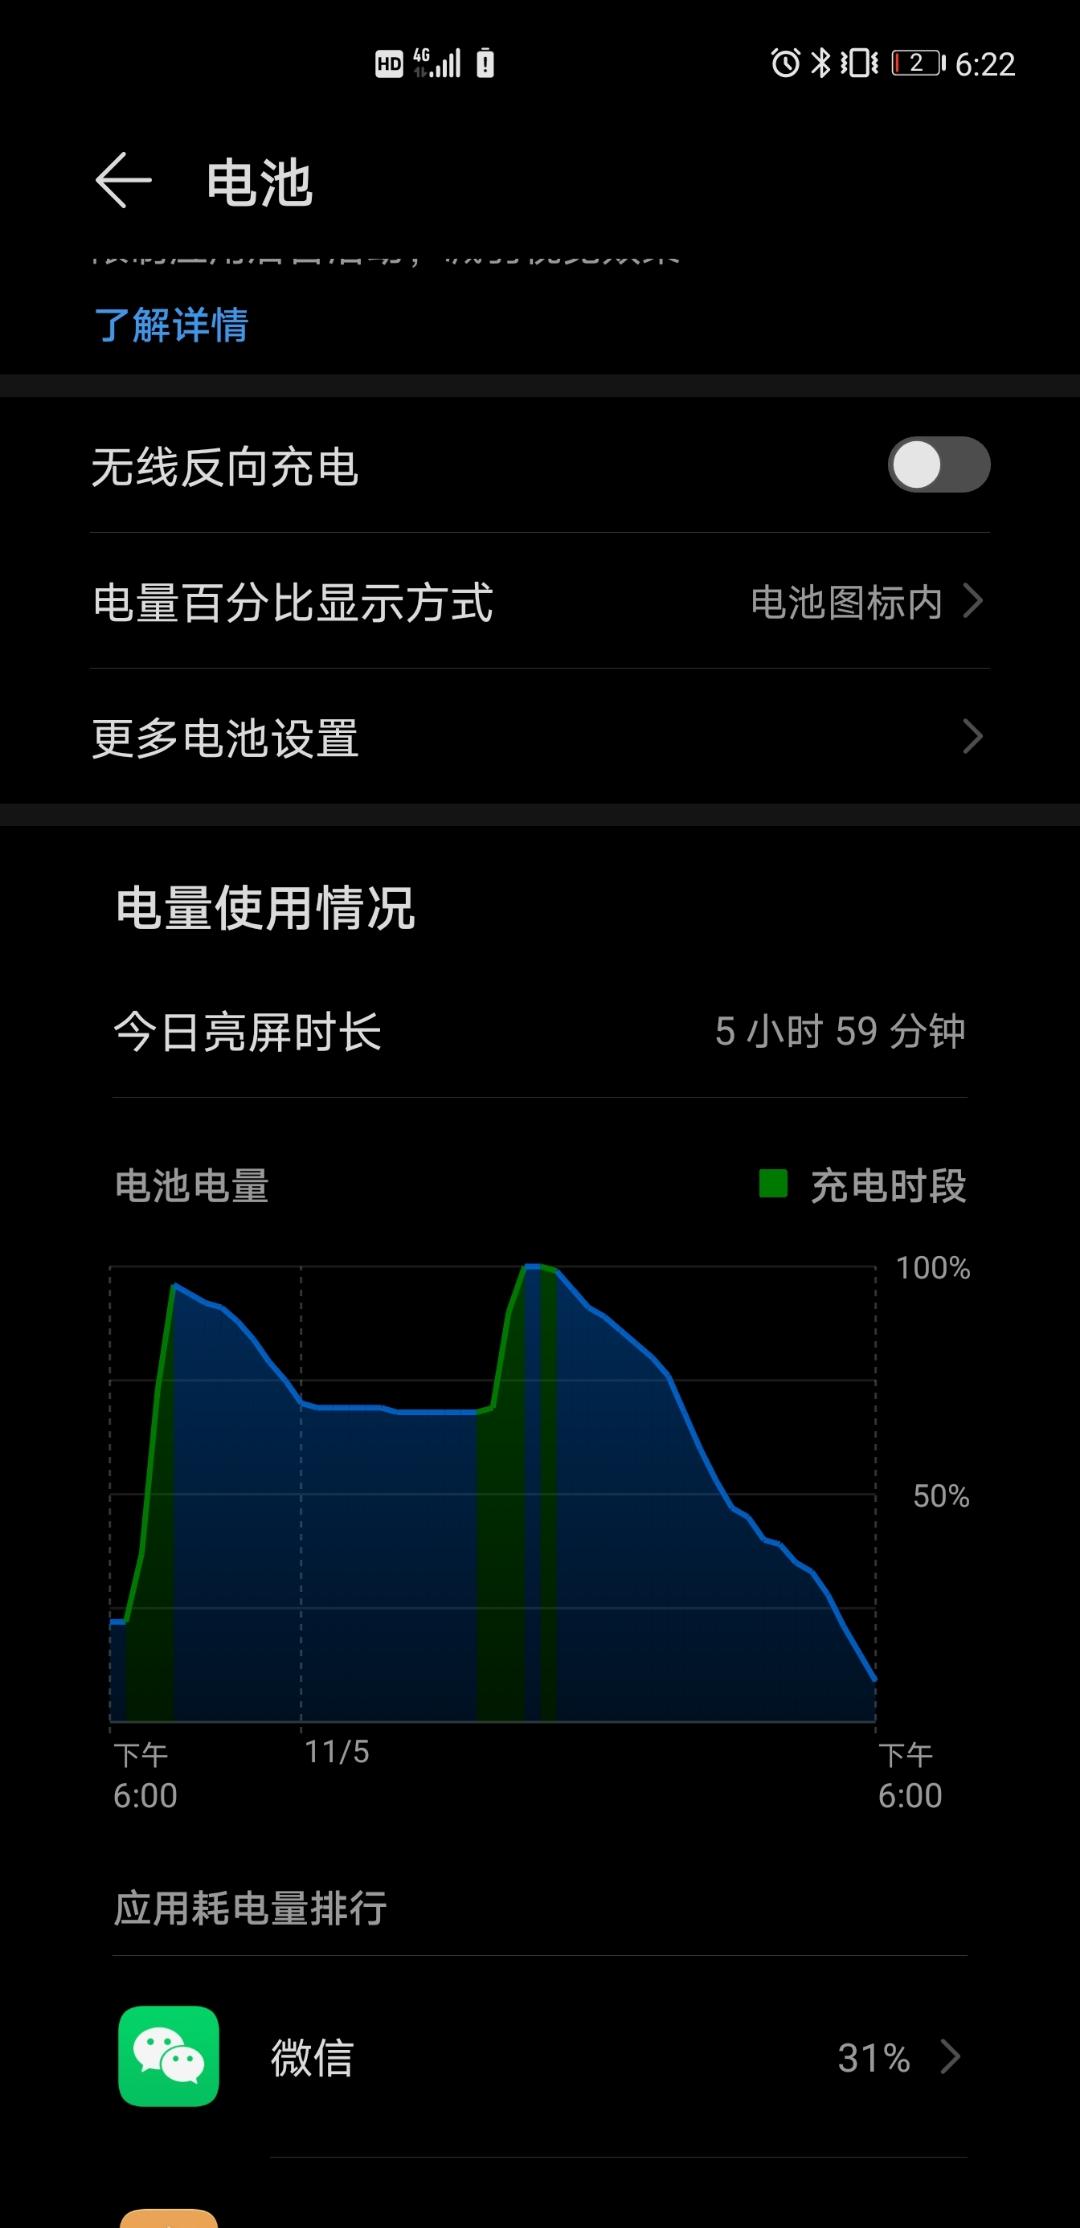 Screenshot_20201105_182243_com.huawei.systemmanager.jpg